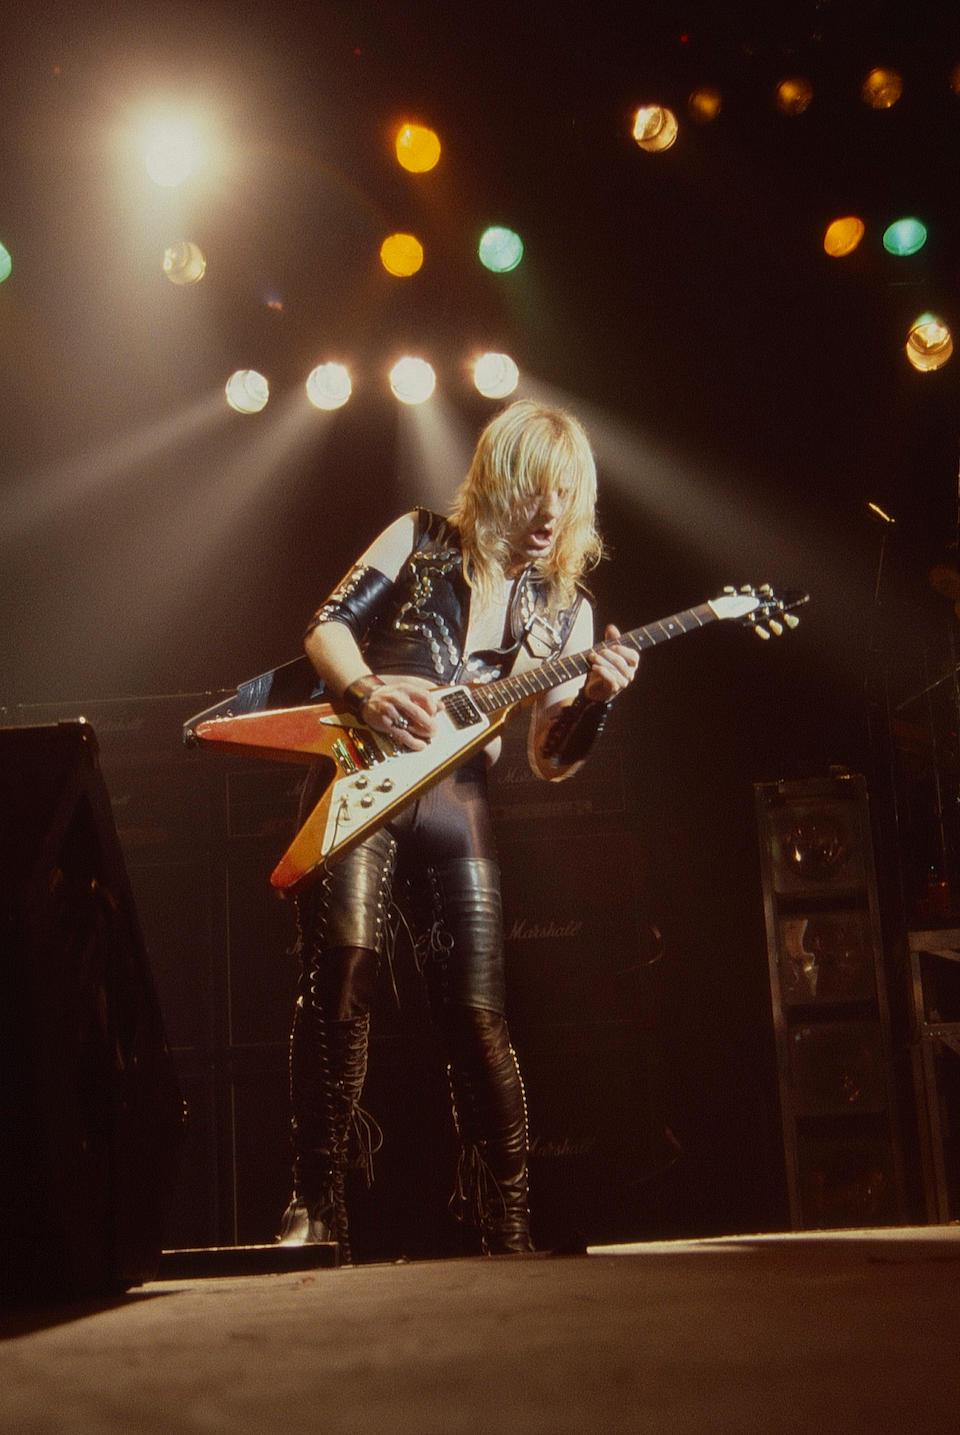 Ken (K.K.) Downing/Judas Priest: A Gibson Flying V guitar, 1967,